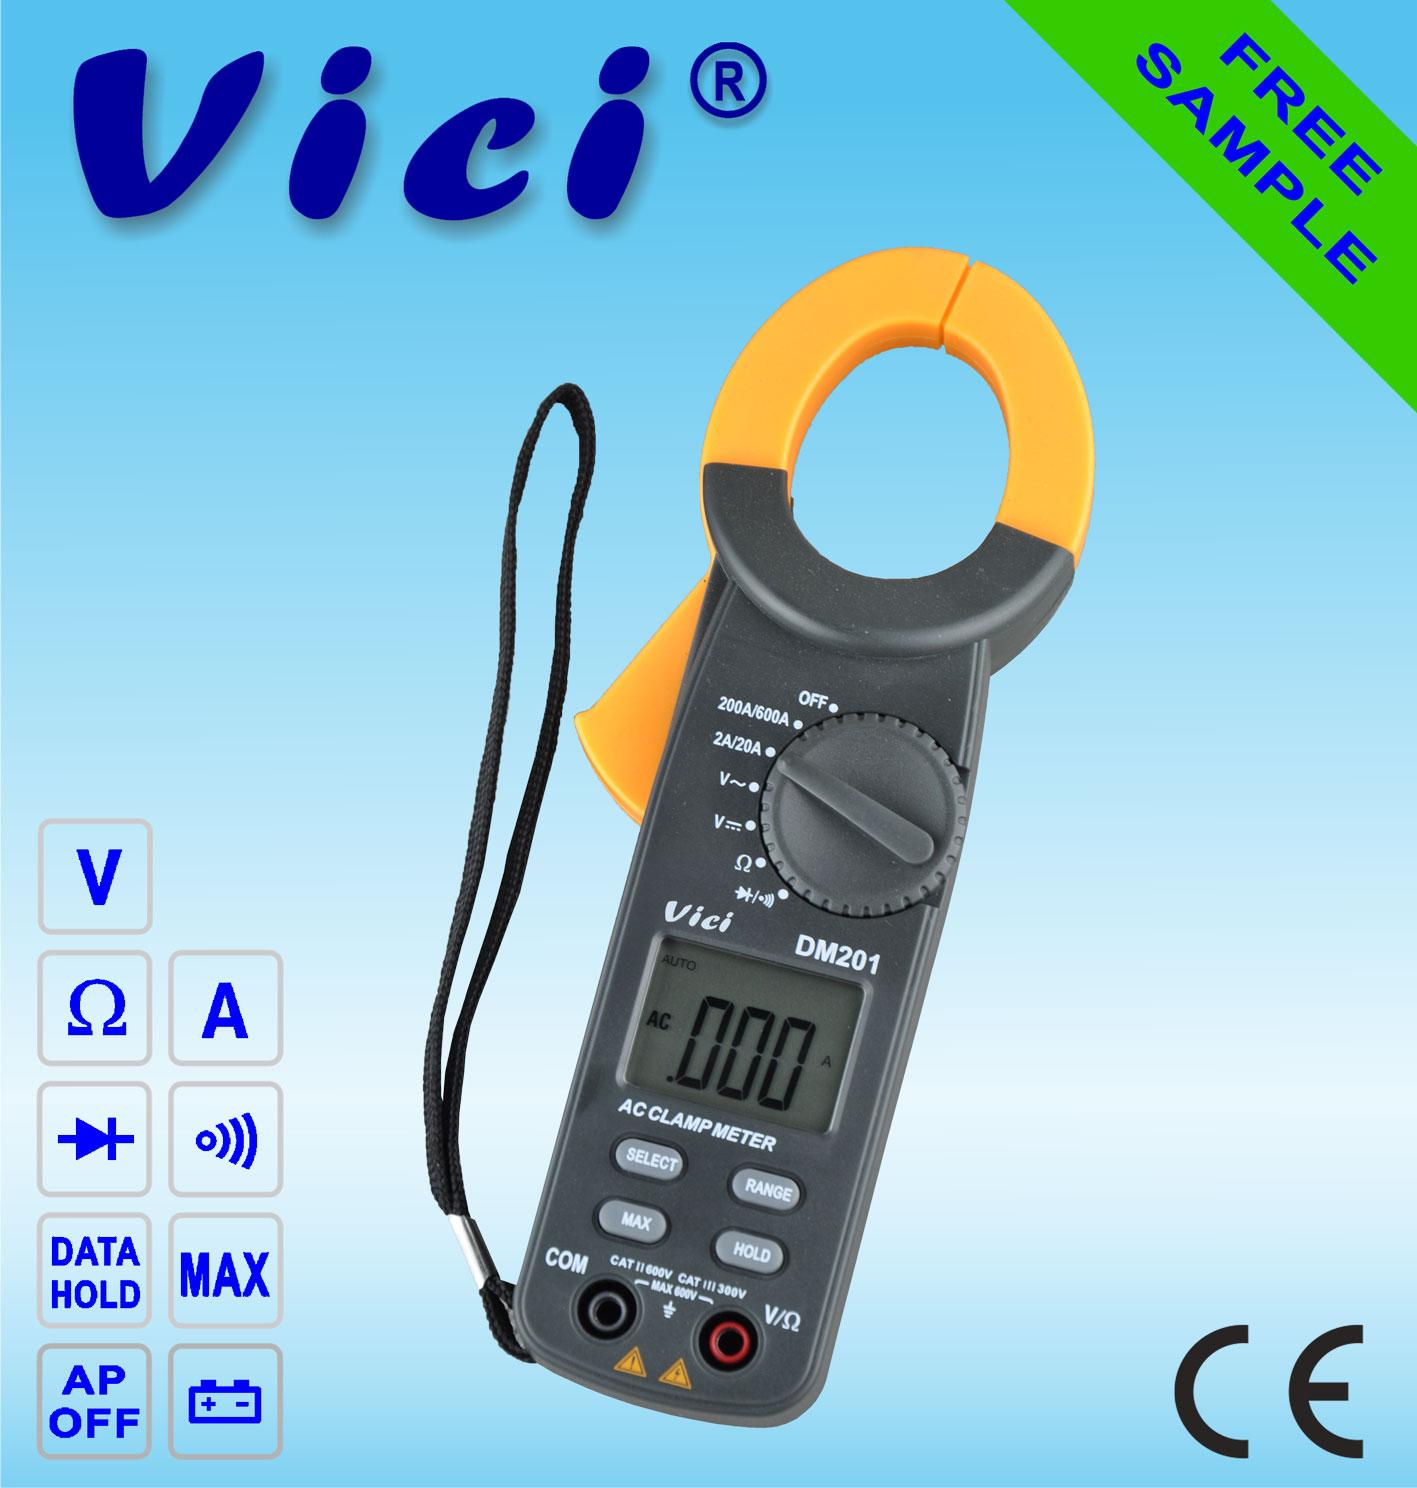 Digital Clamp Meters Cm 03 : Vc transistor tester equipmentimes